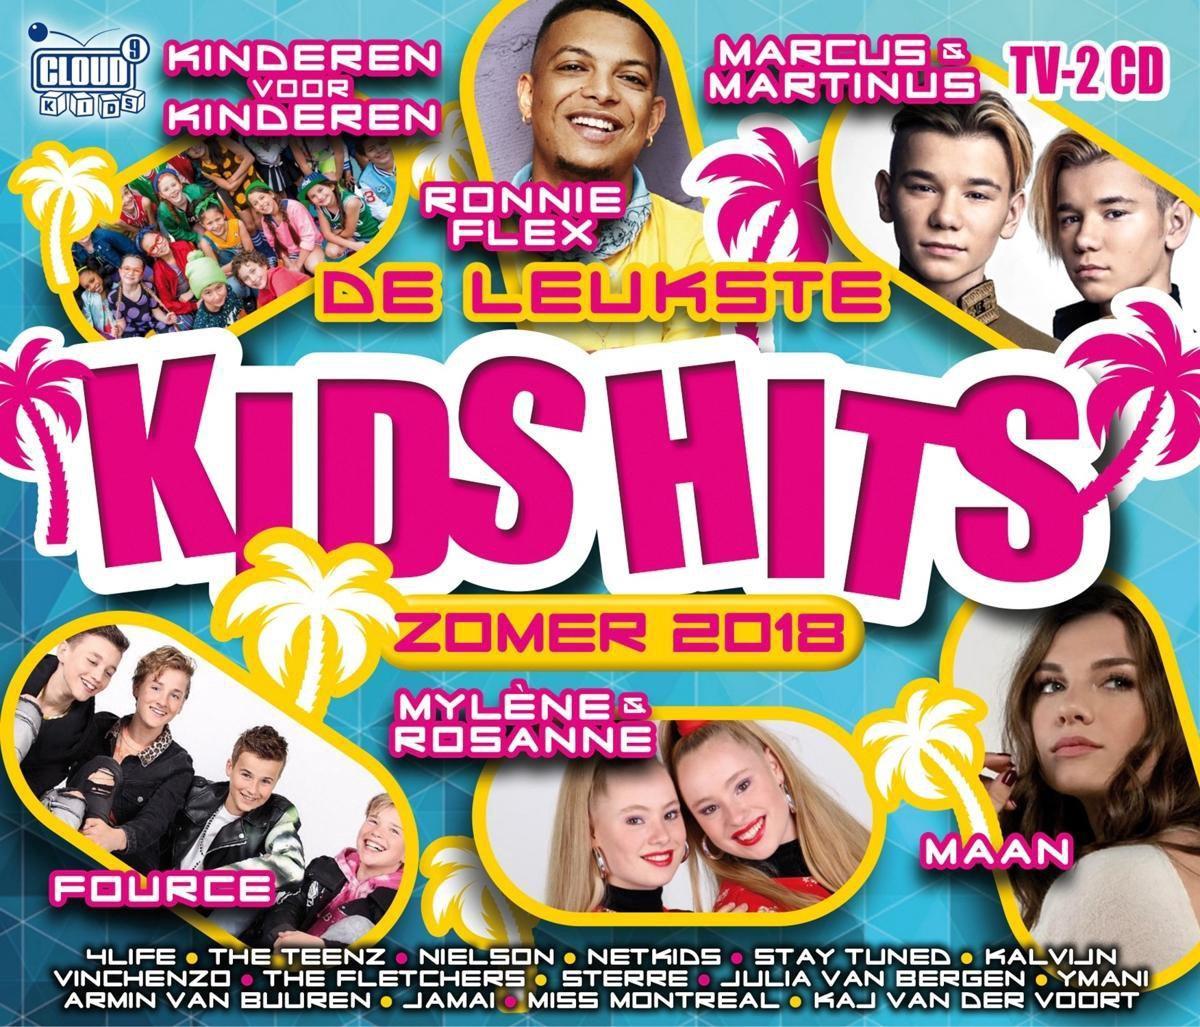 De Leukste Kids Hits Zomer 2018 - De Leukste Kids Hits